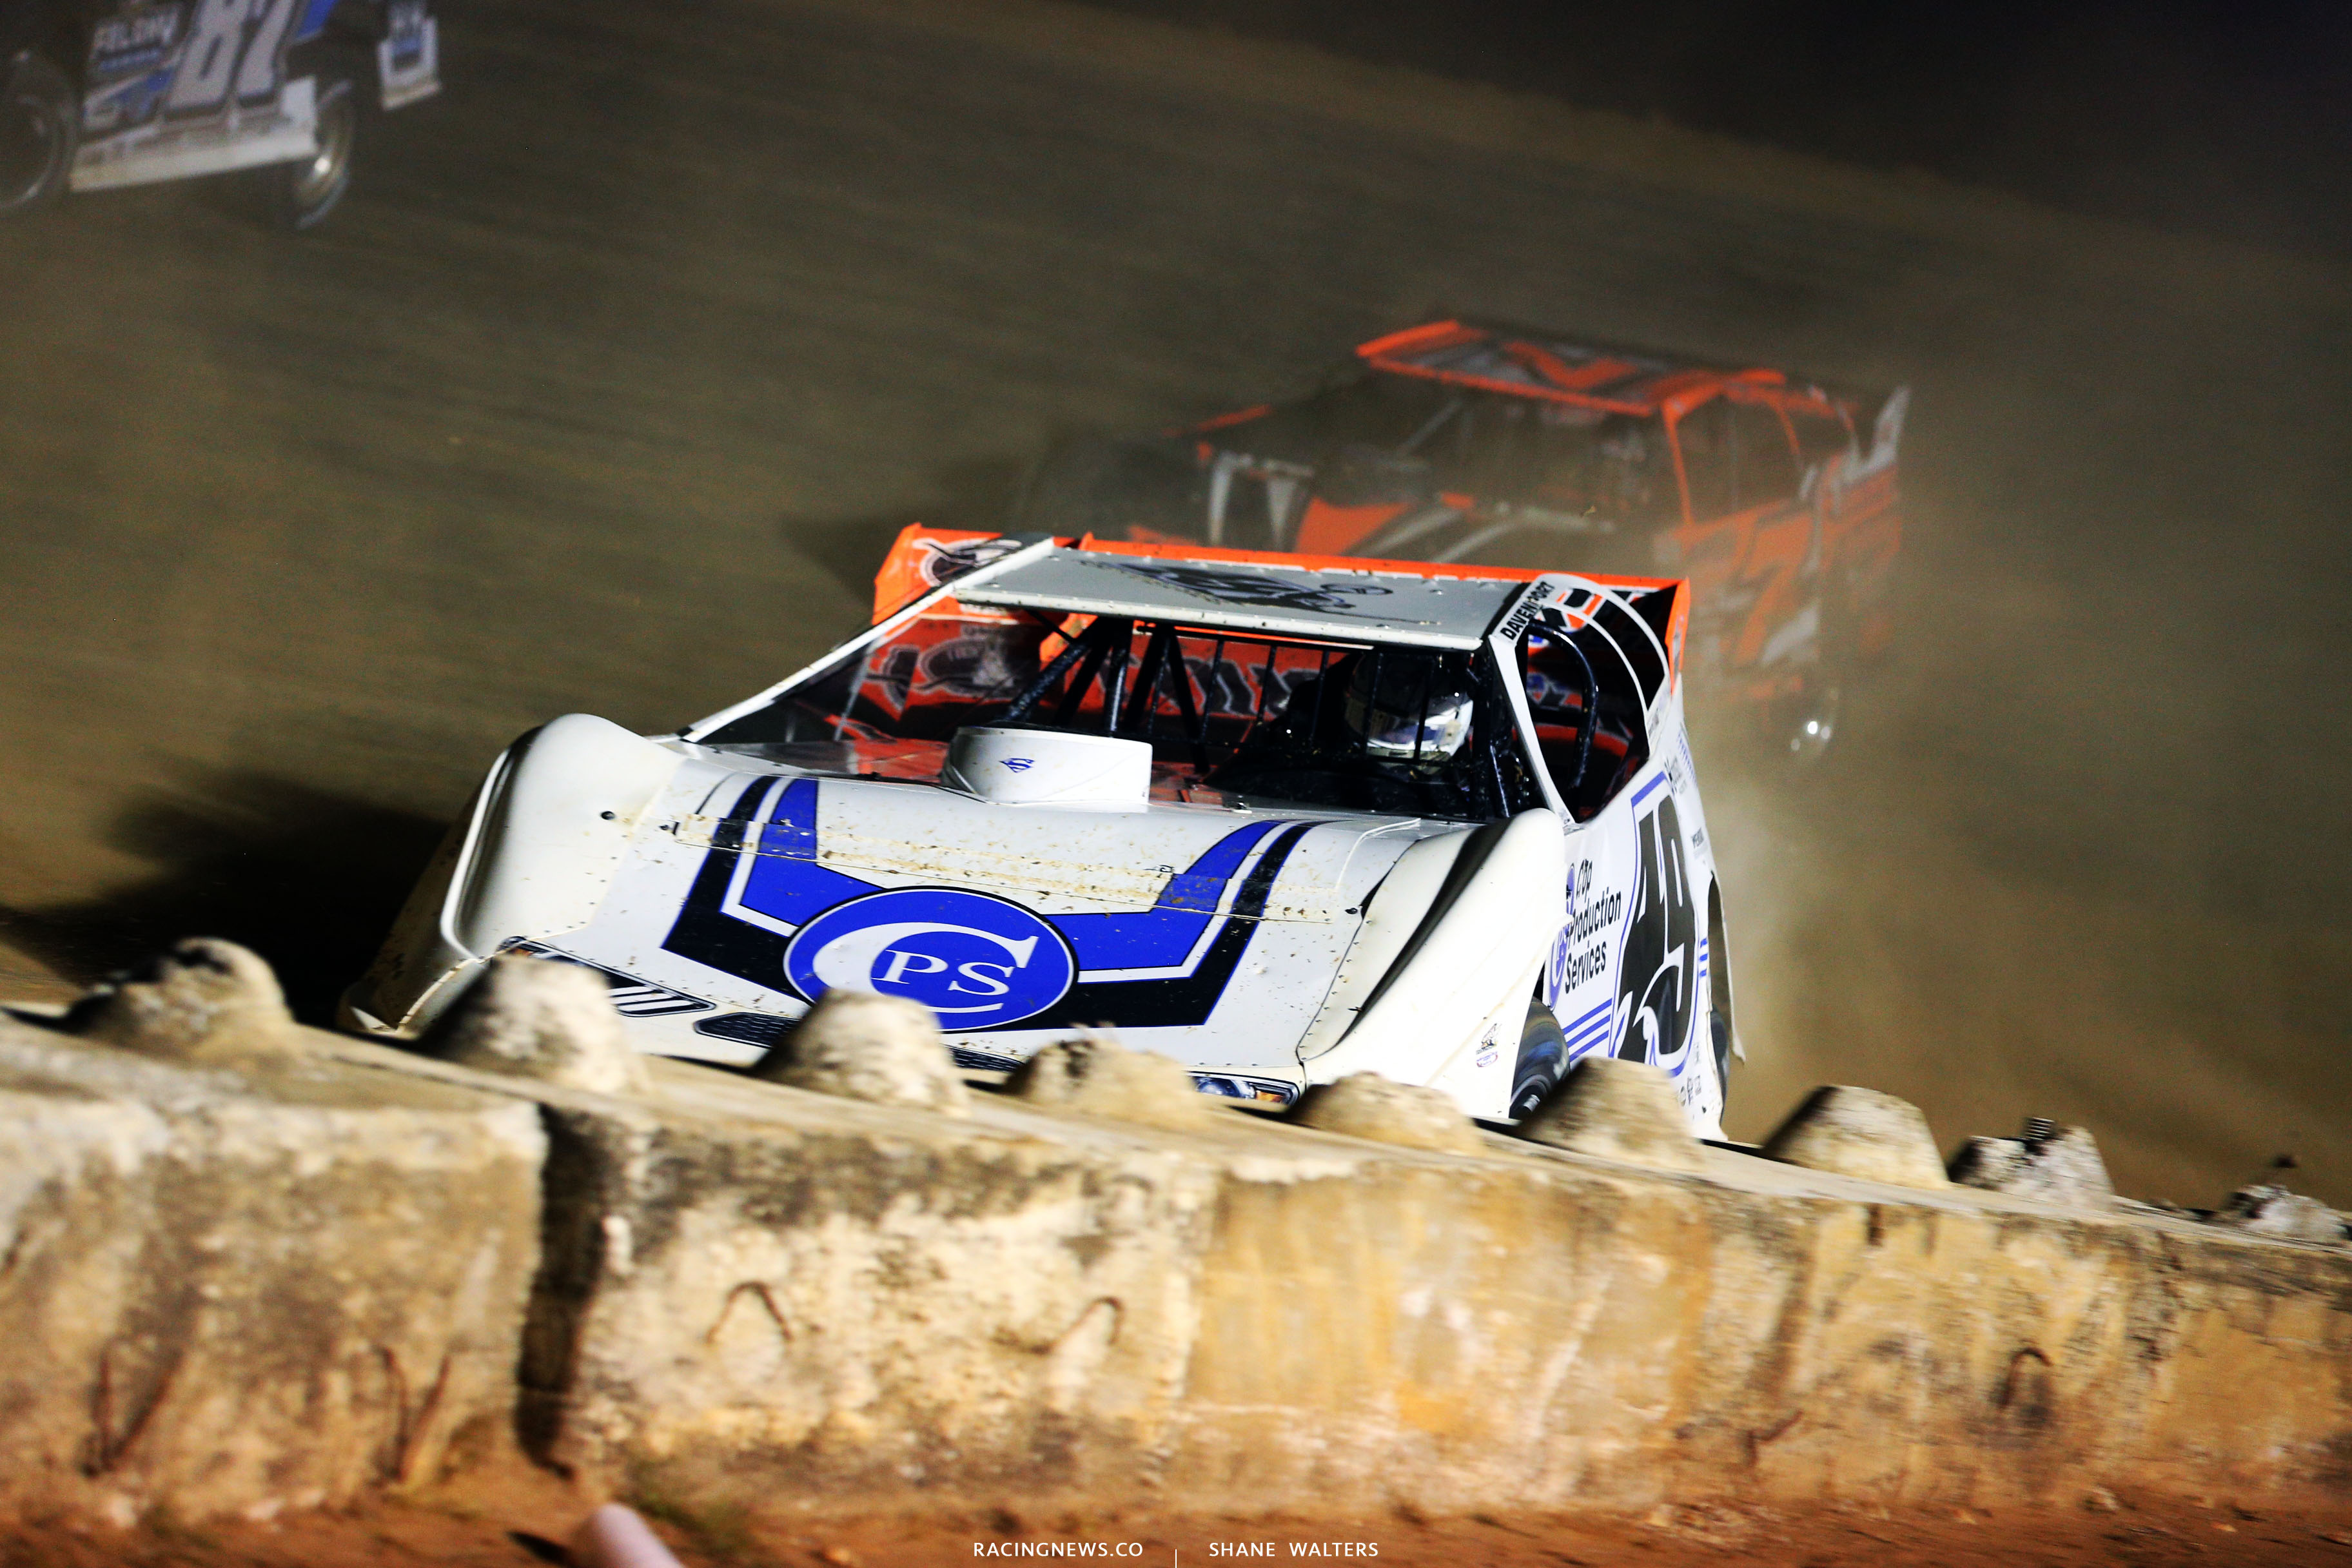 New 2018 Lucas Oil Late Model Dirt Series rules - Racing News